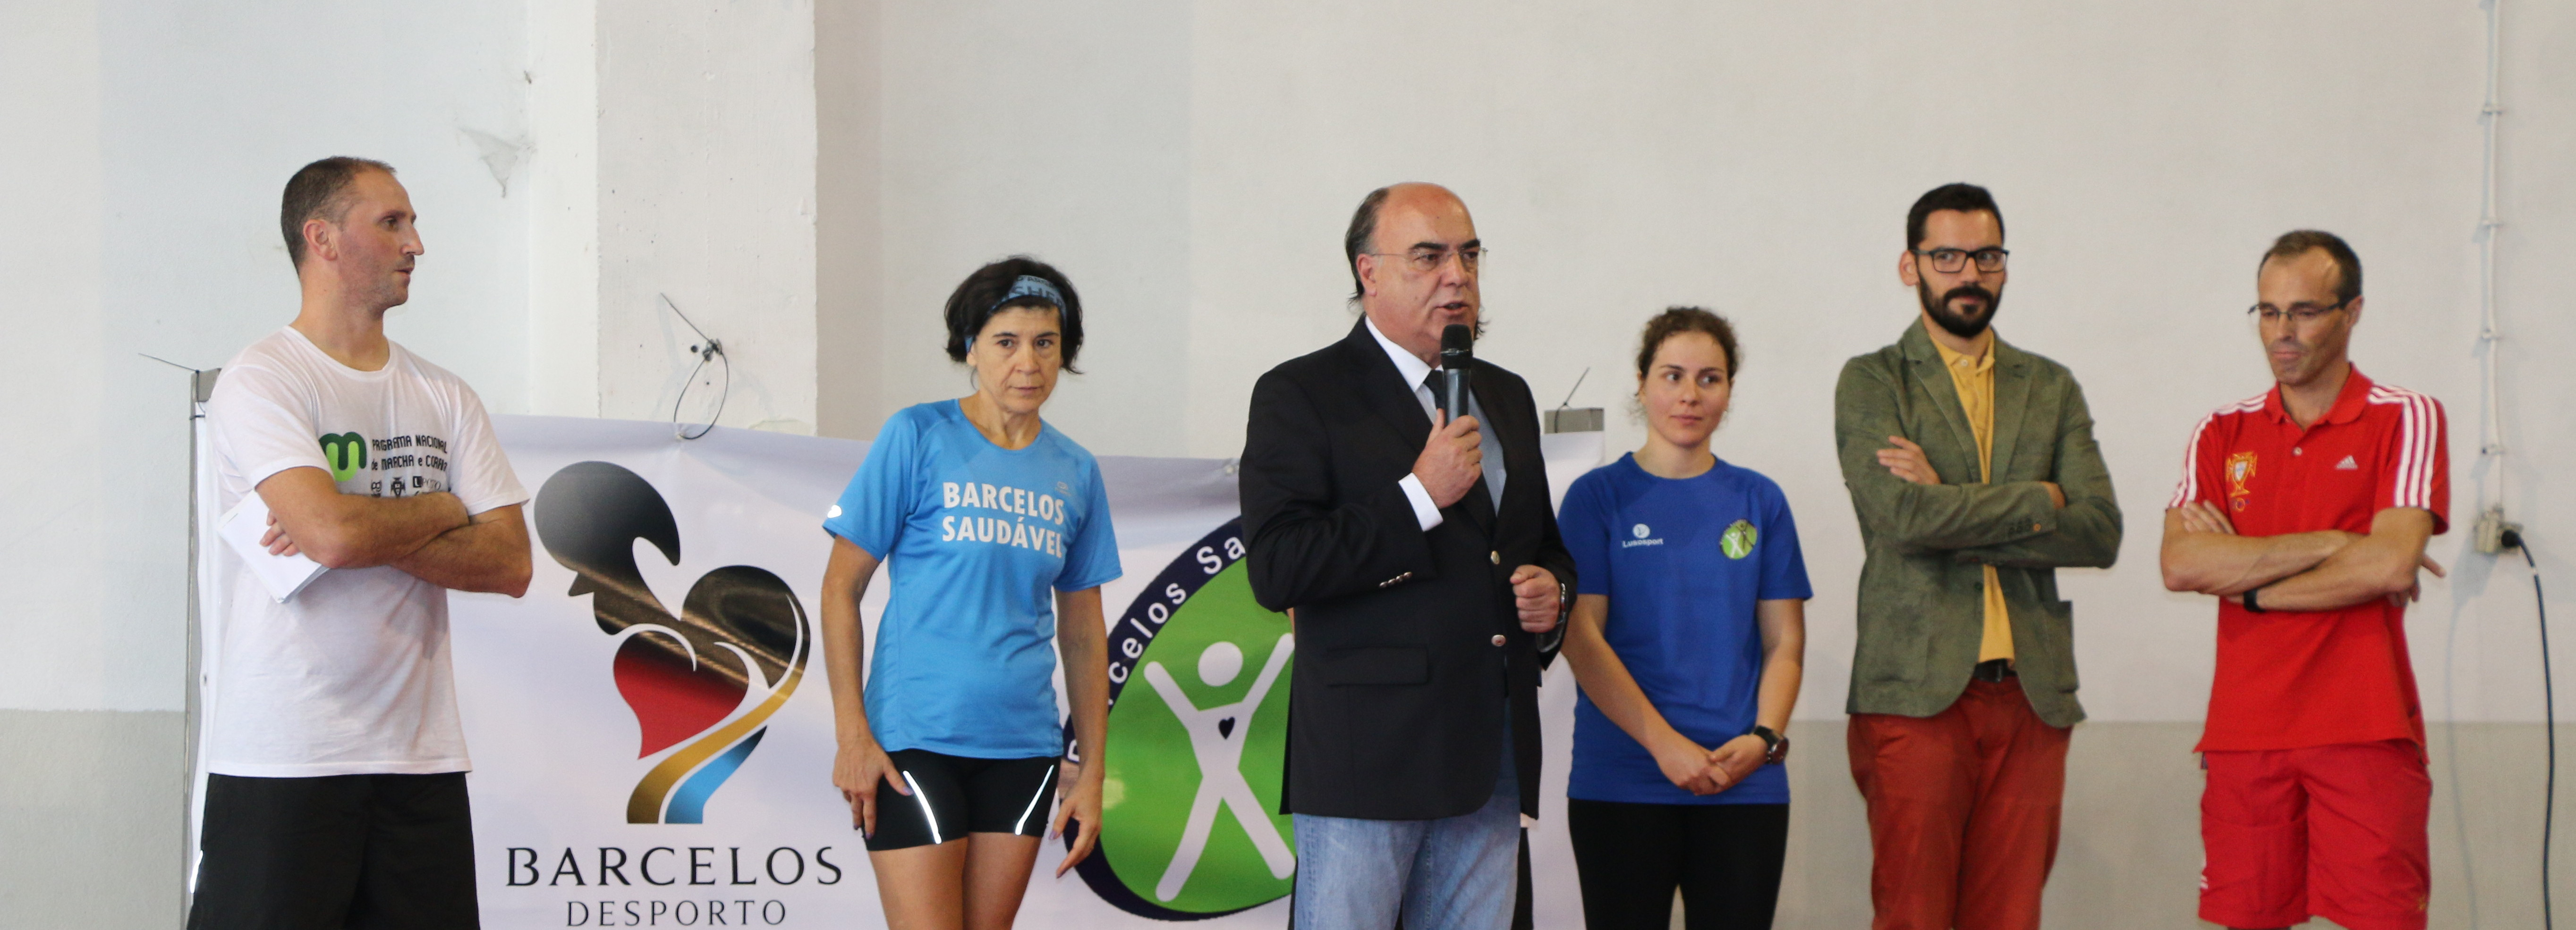 Reabriu o Centro Municipal de Marcha e Corrida de Barcelos para a nova época desportiva